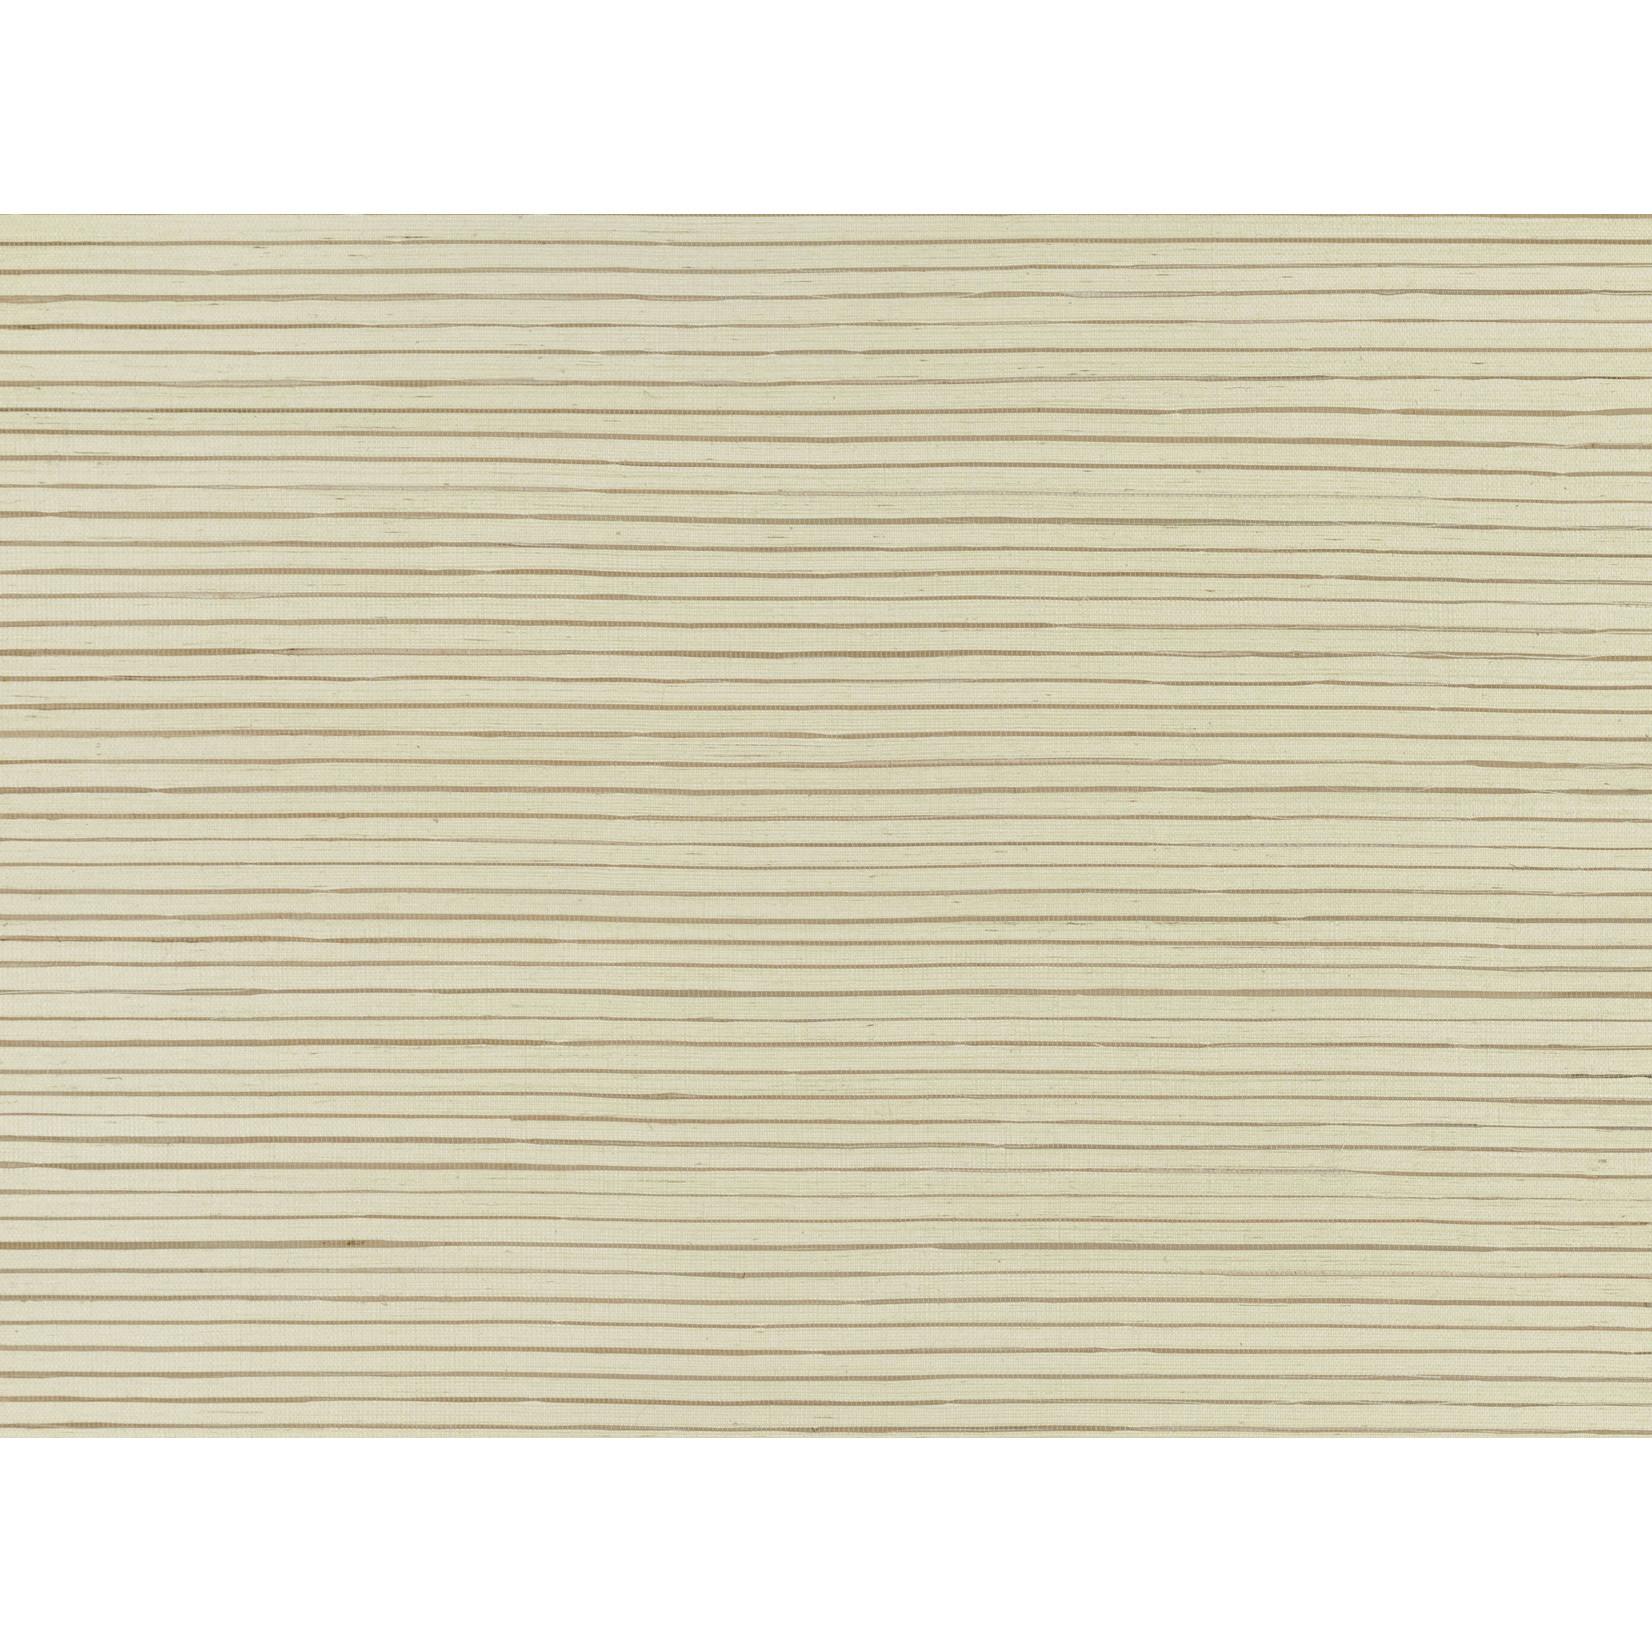 Mark Alexander Grasscloth Handwoven Wallcoverings | Seagrass Celery